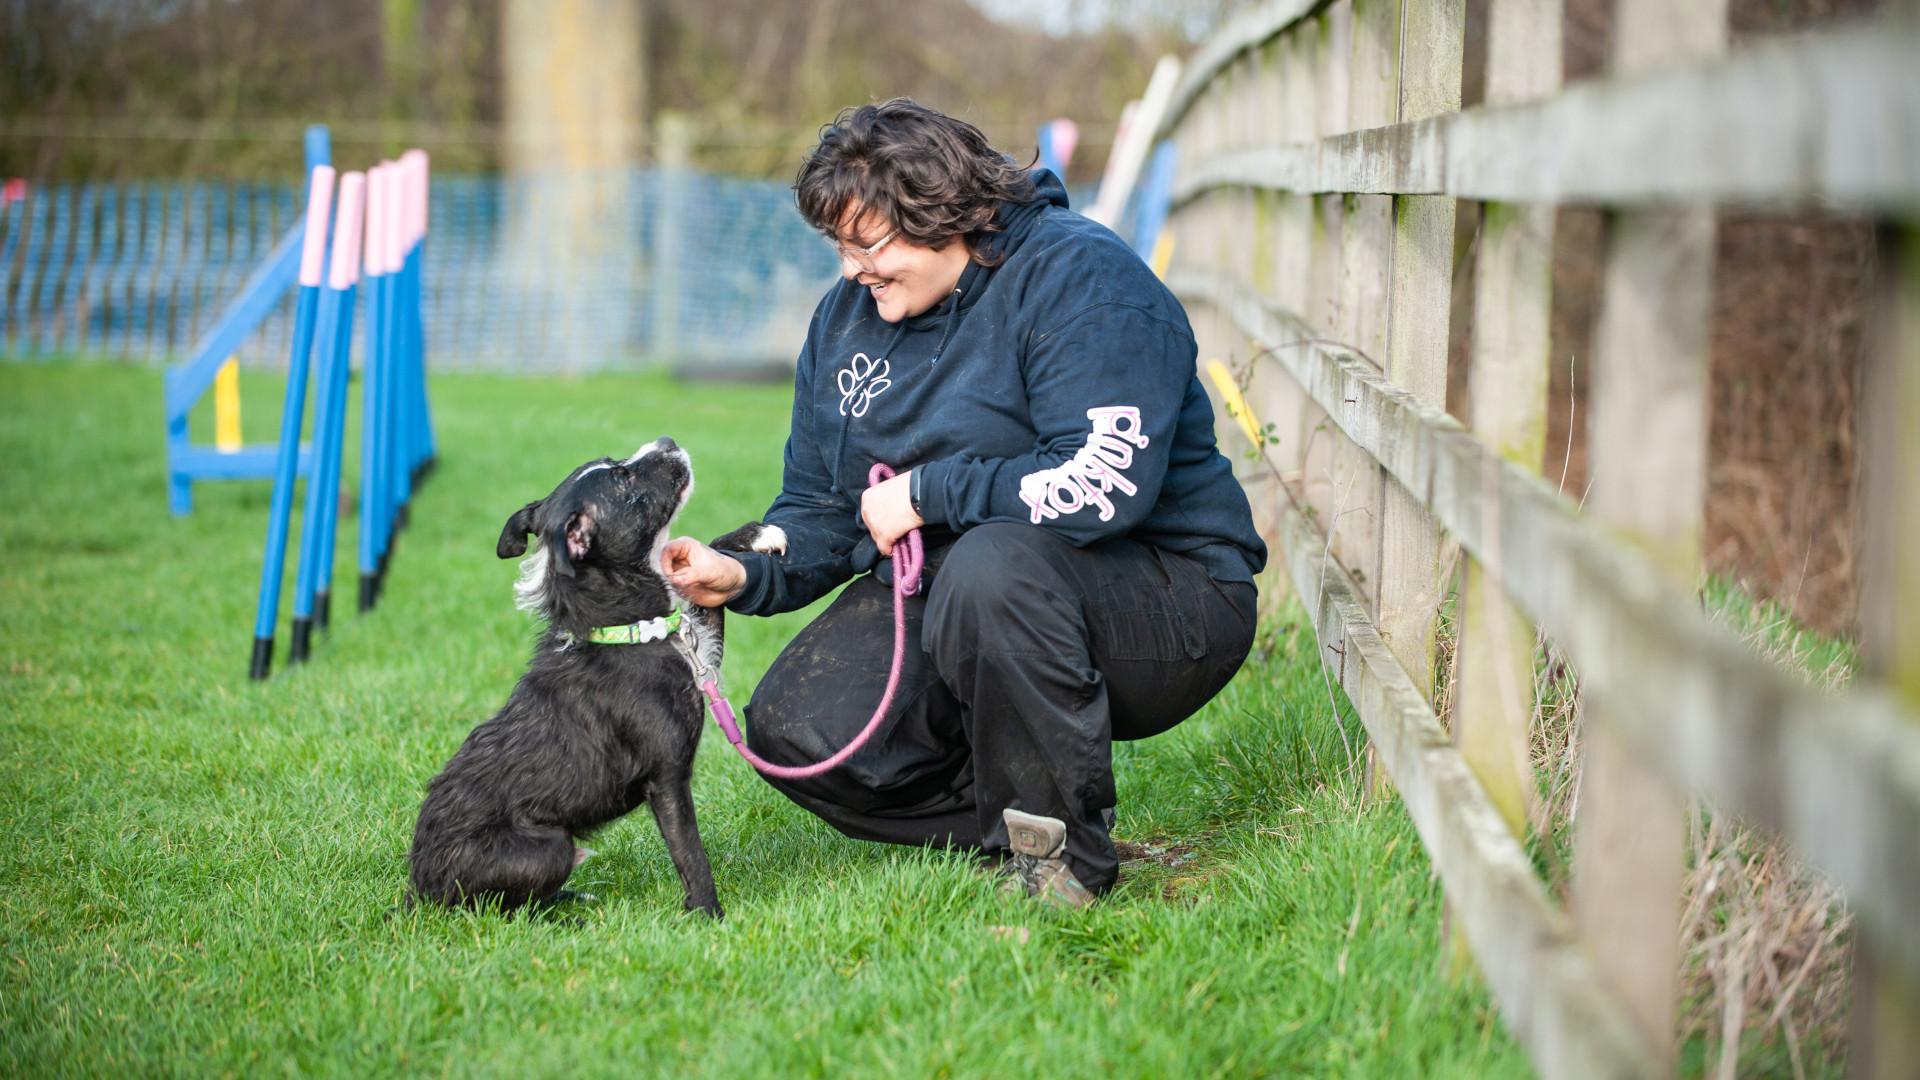 Canine positive behaviour specialist